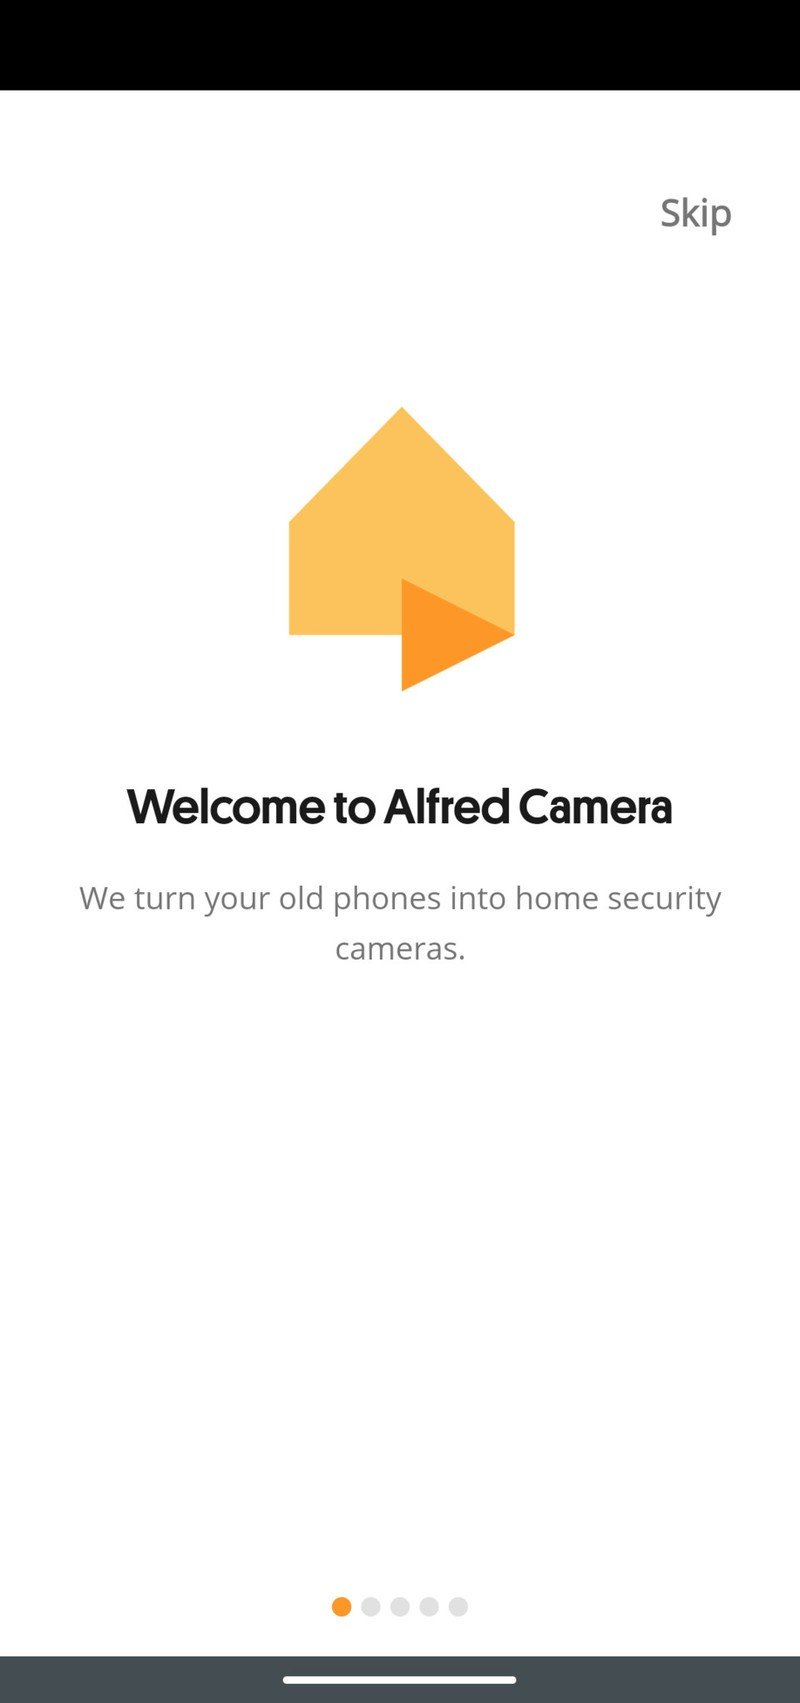 alfred-camera-1.jpg?itok=jujysRTB